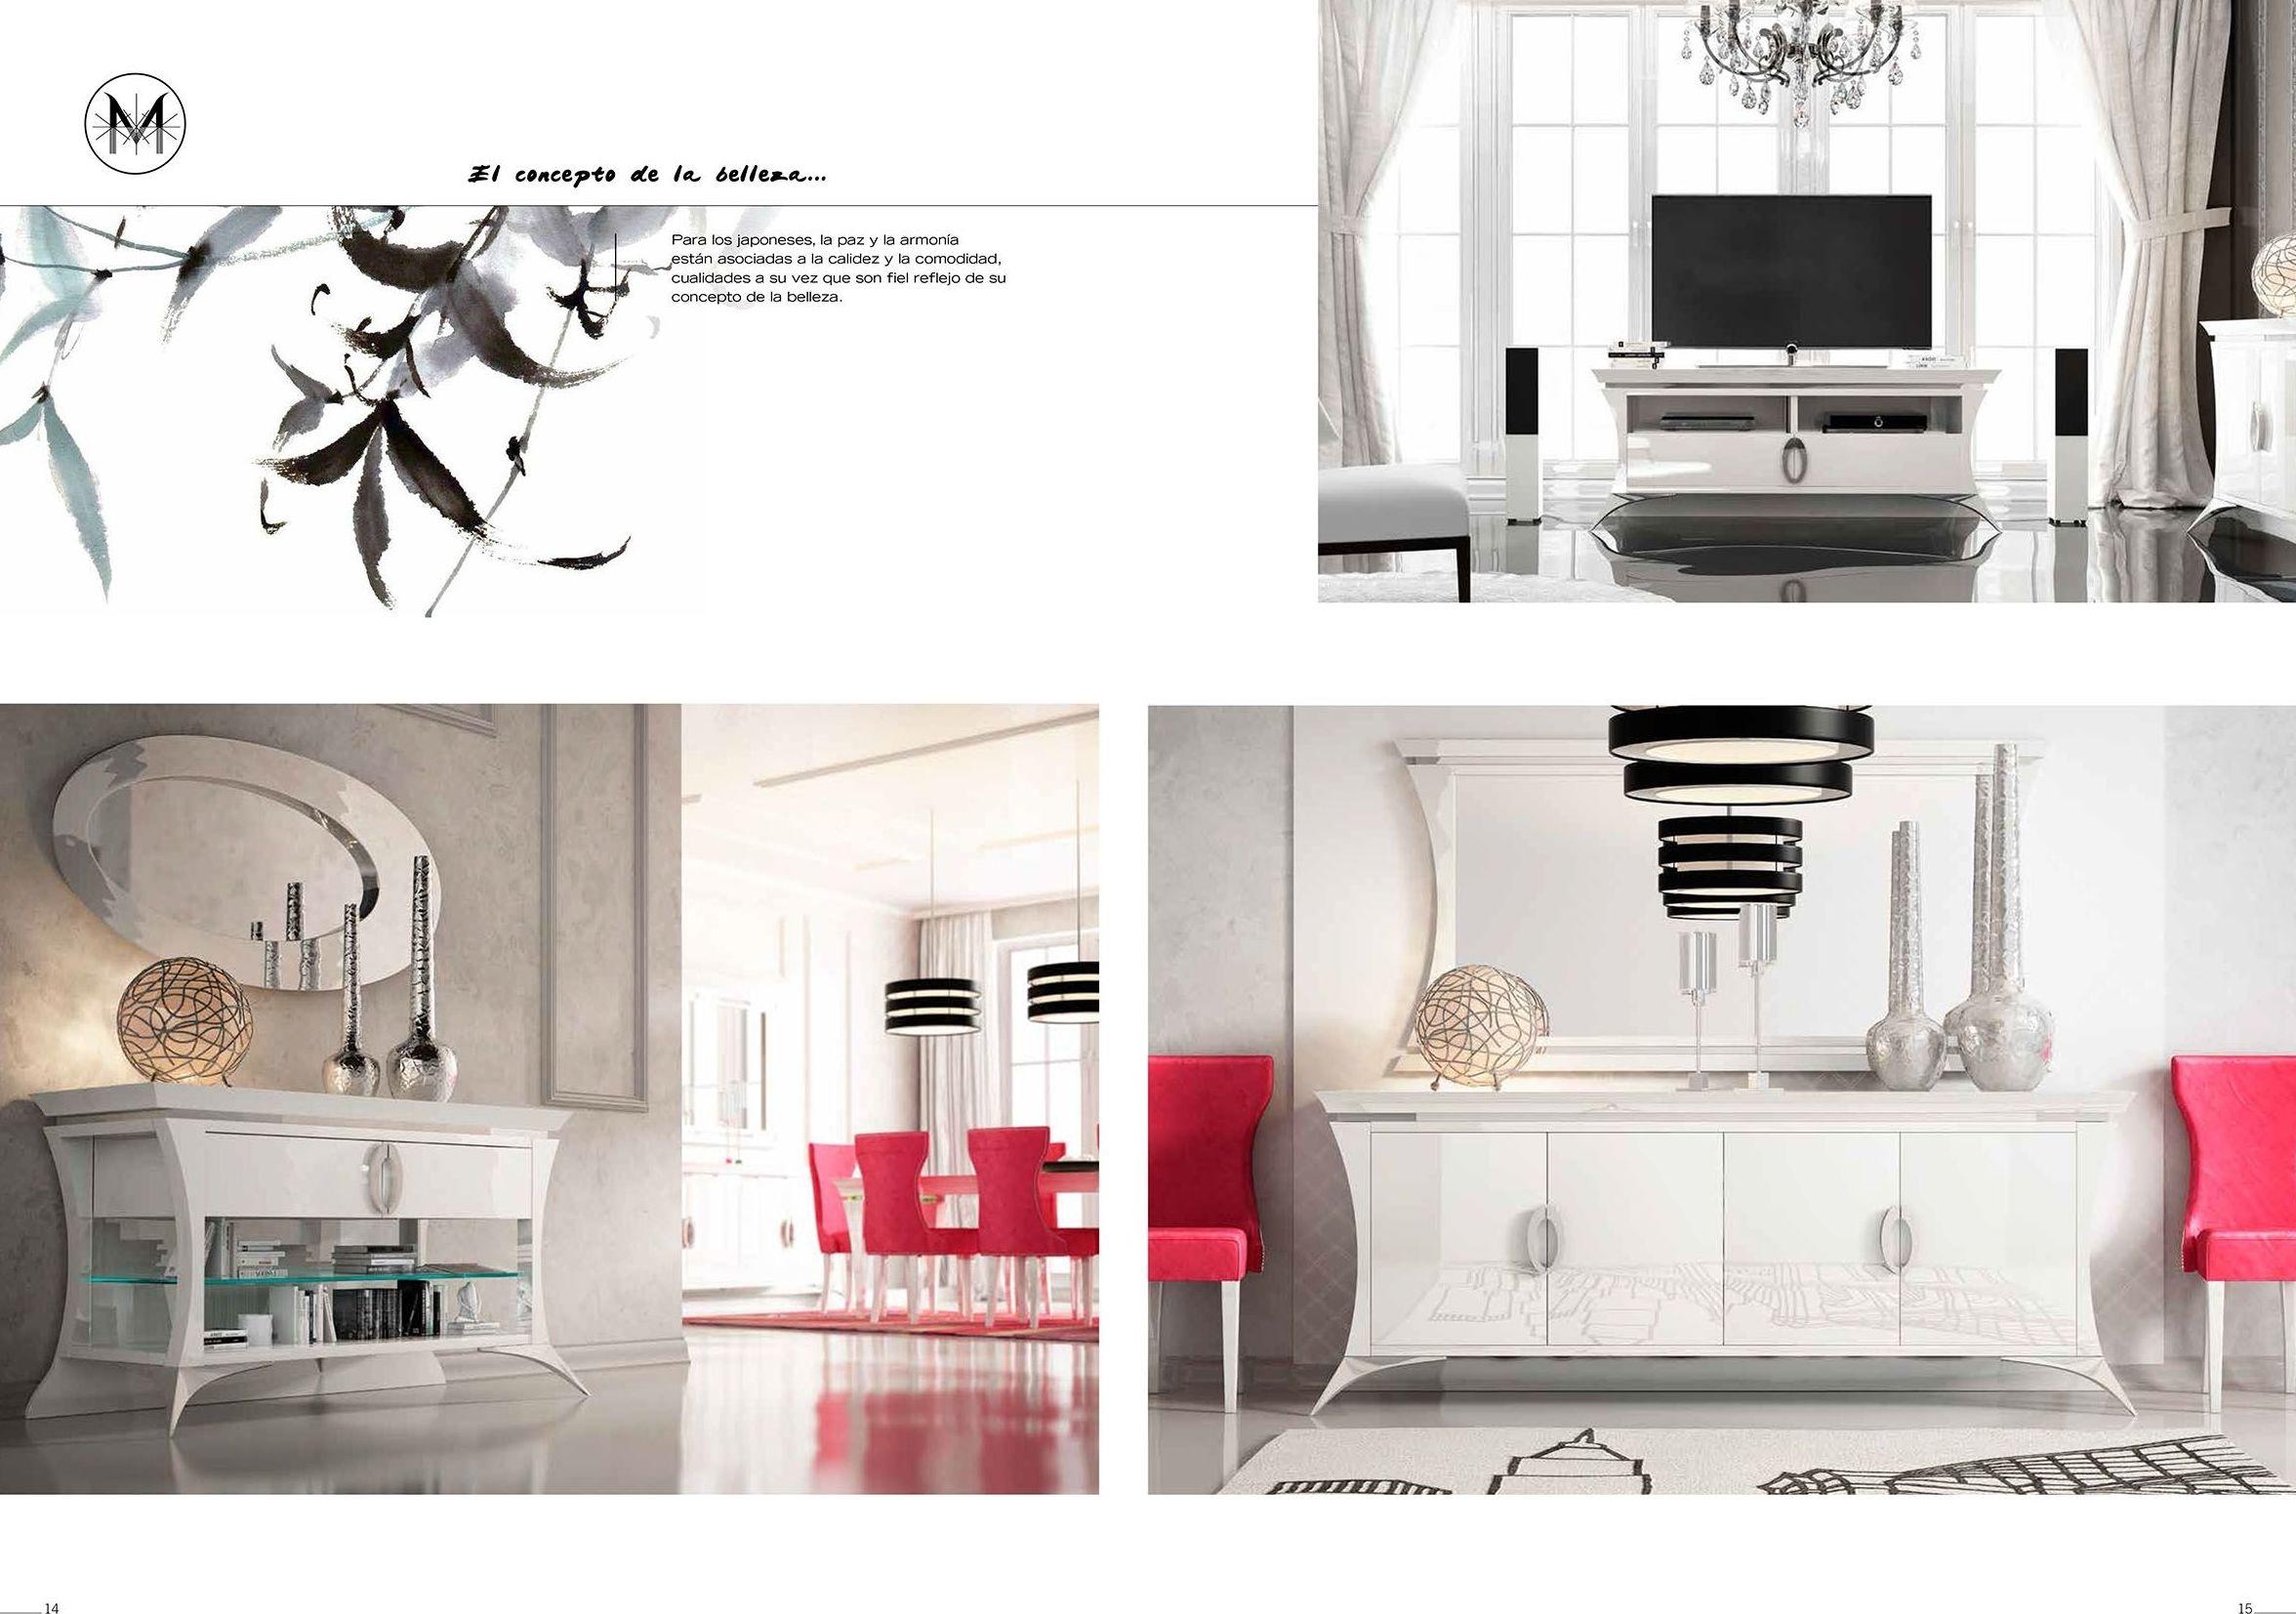 Foto 119 de Muebles en Getafe | Goga Muebles & Complementos